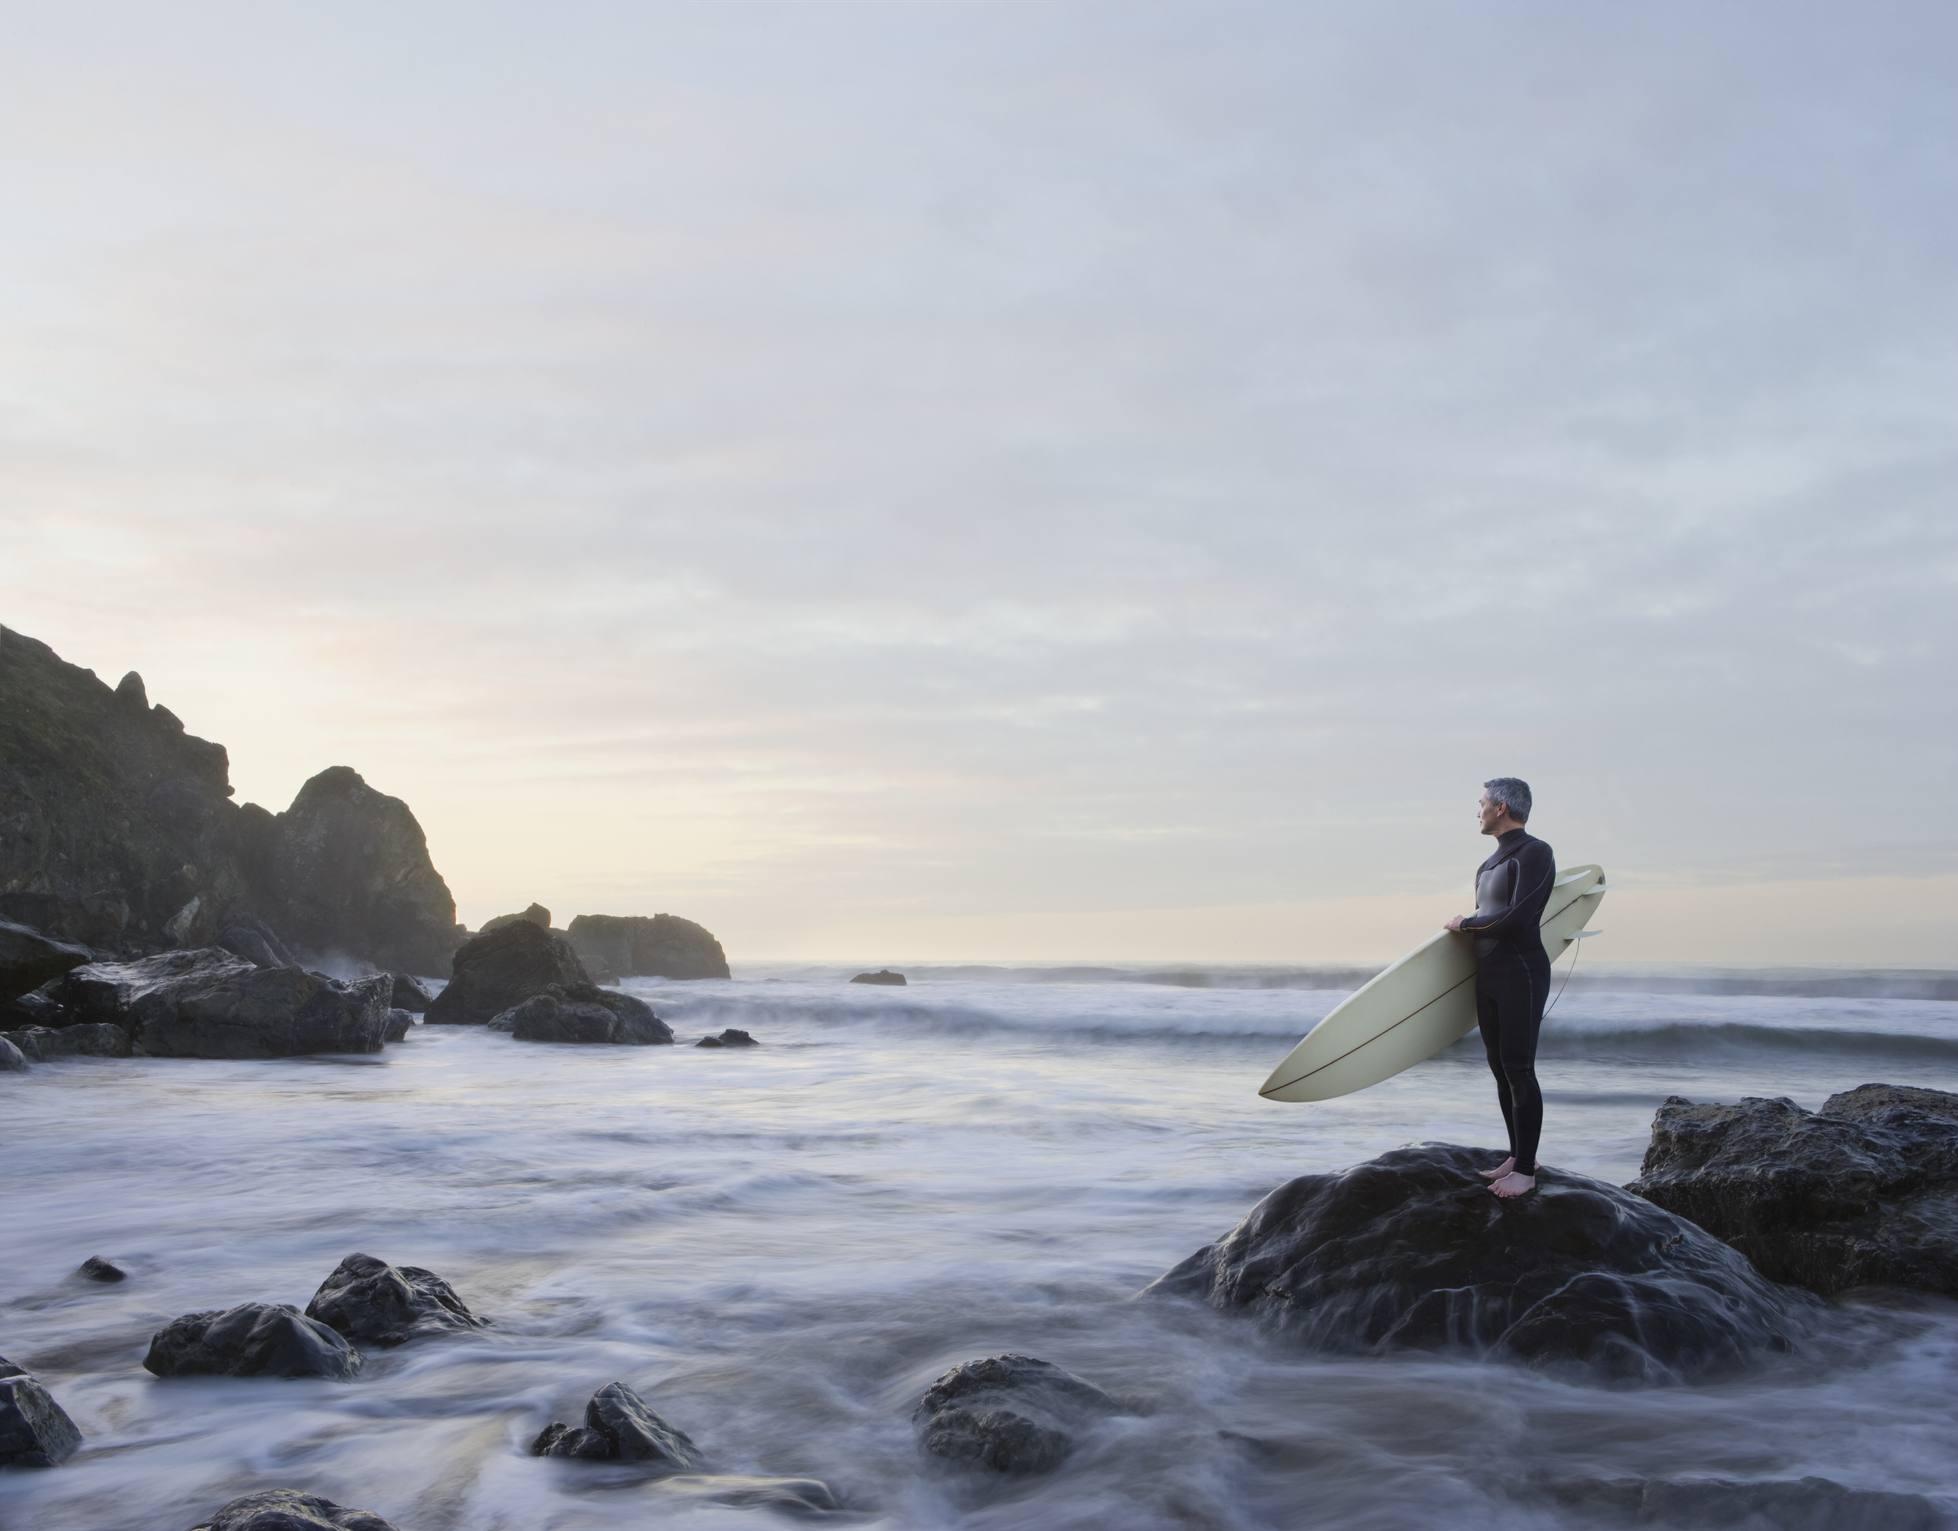 Surfer standing on rock in ocean, Stinson Beach